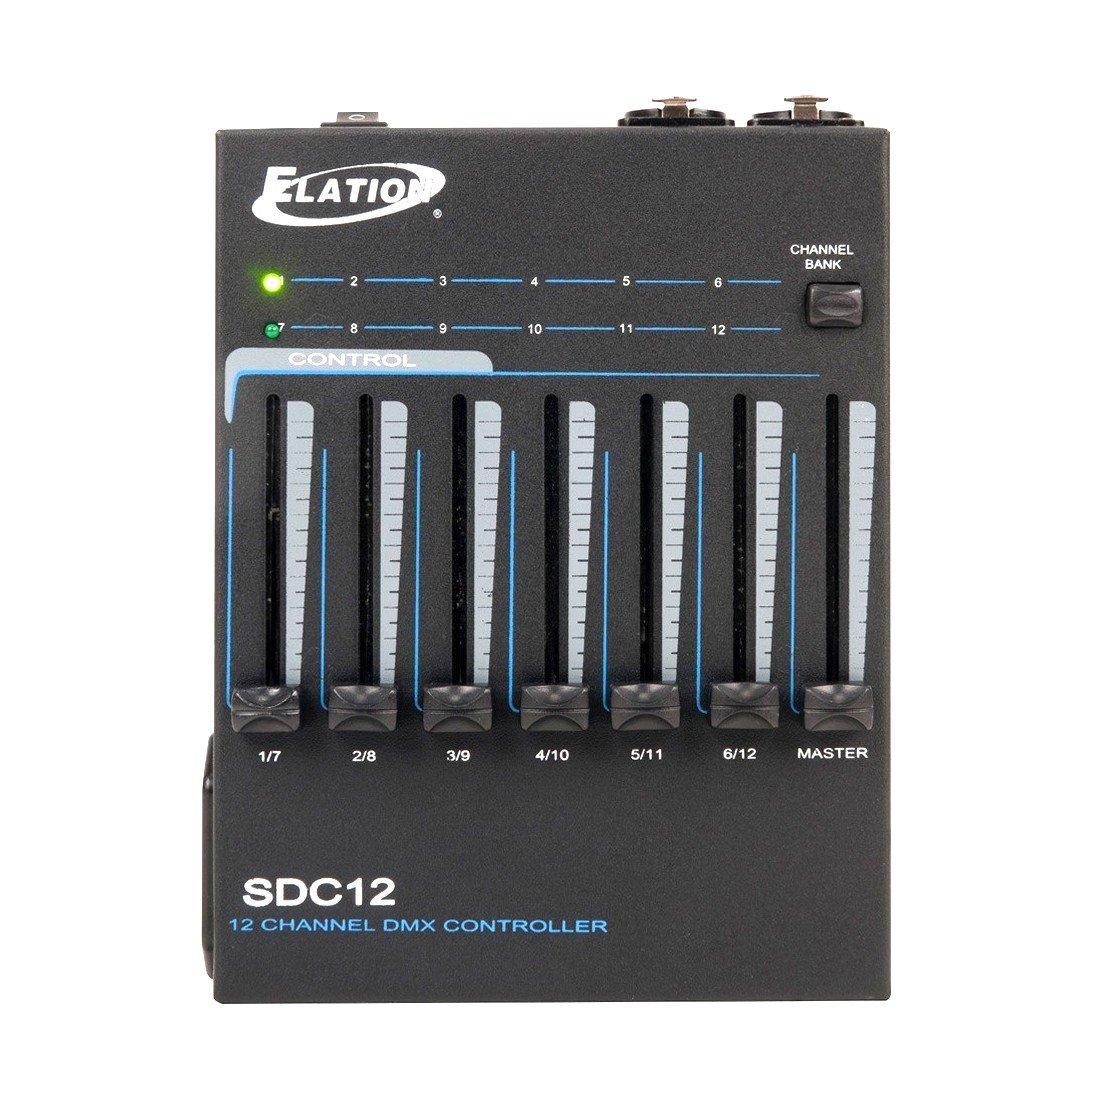 Elation SDC12 DMX Controller